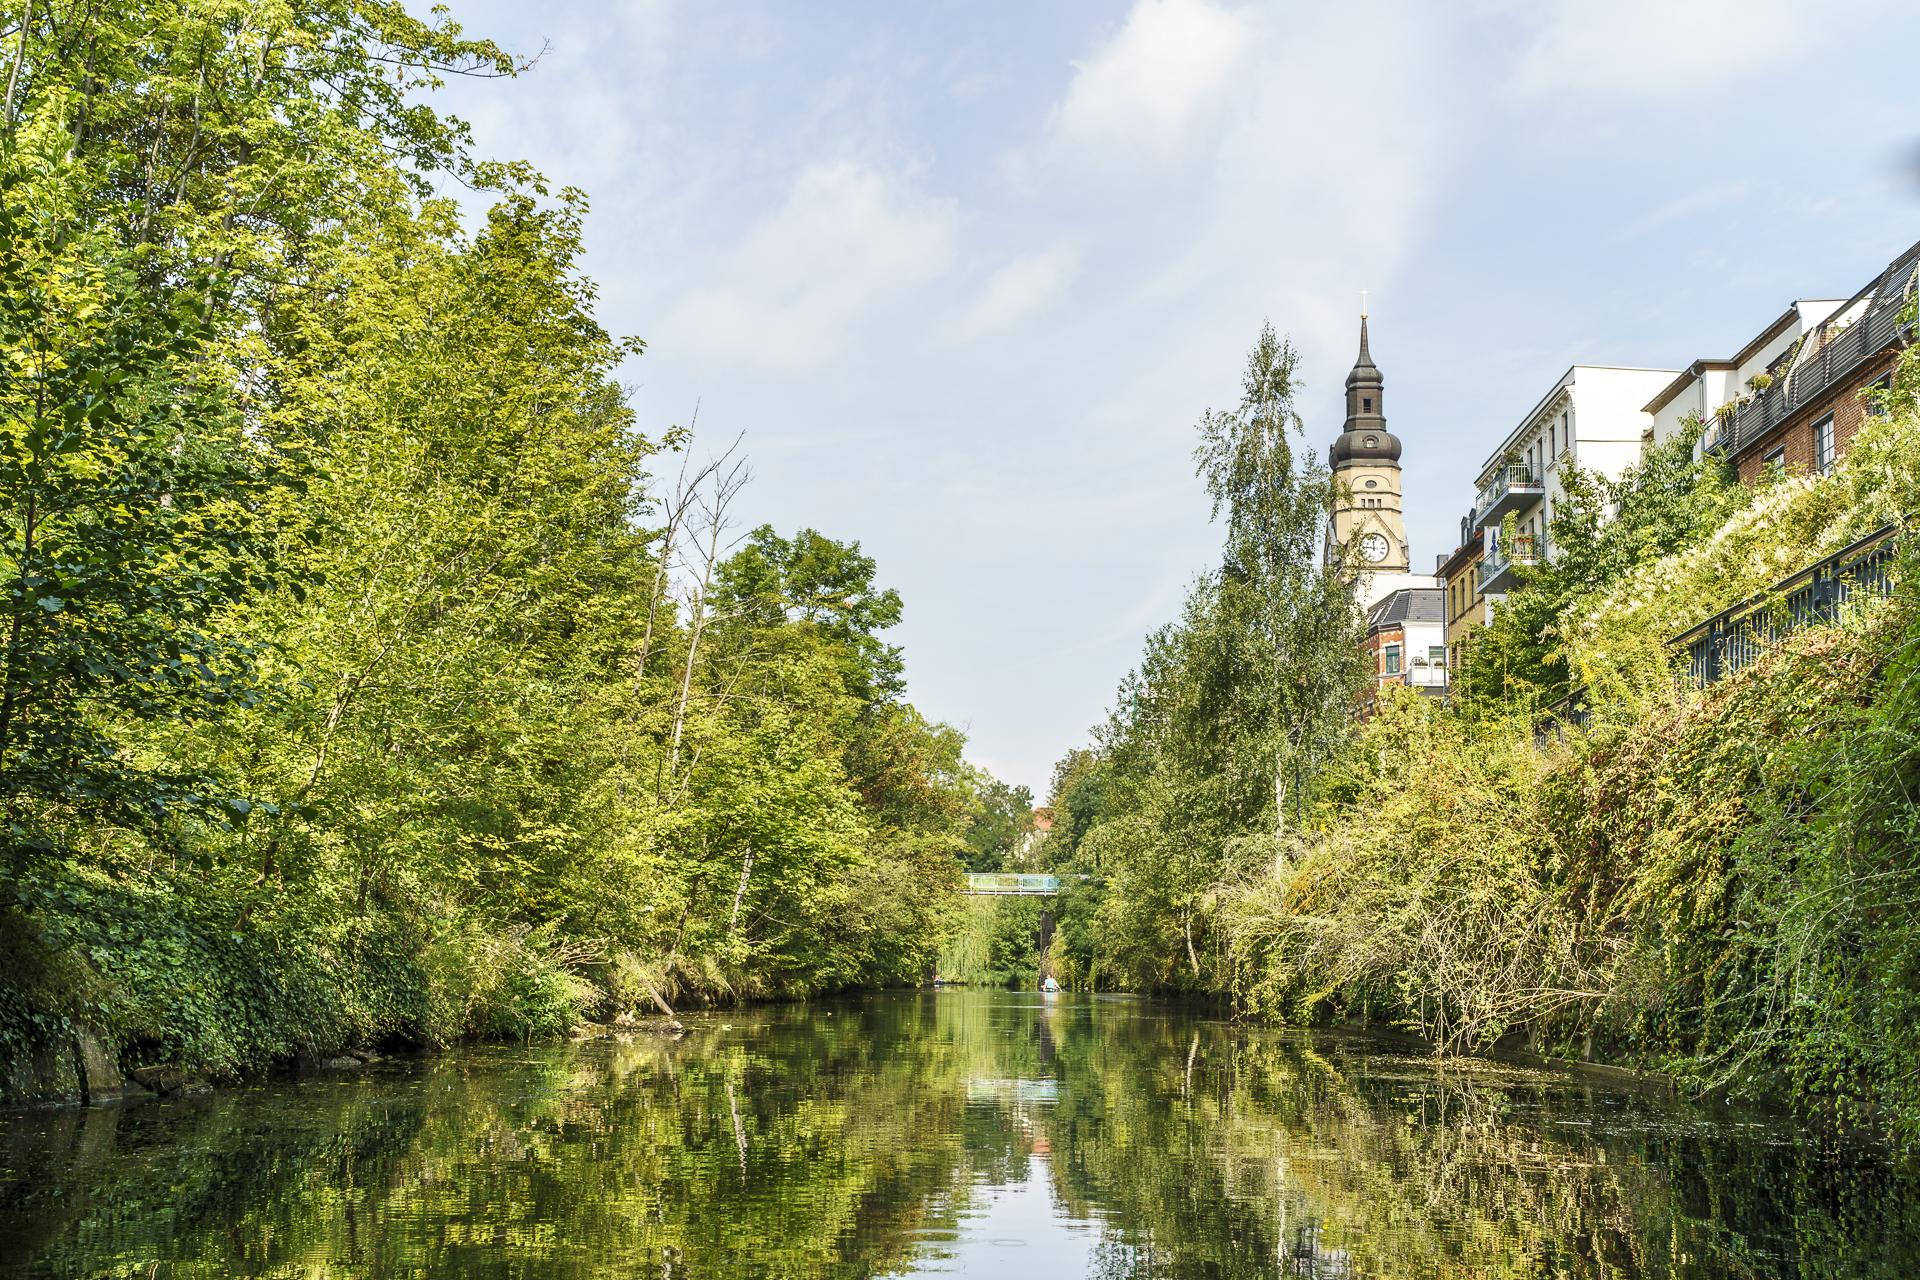 Karl-Heine-Kanal Plagwitz